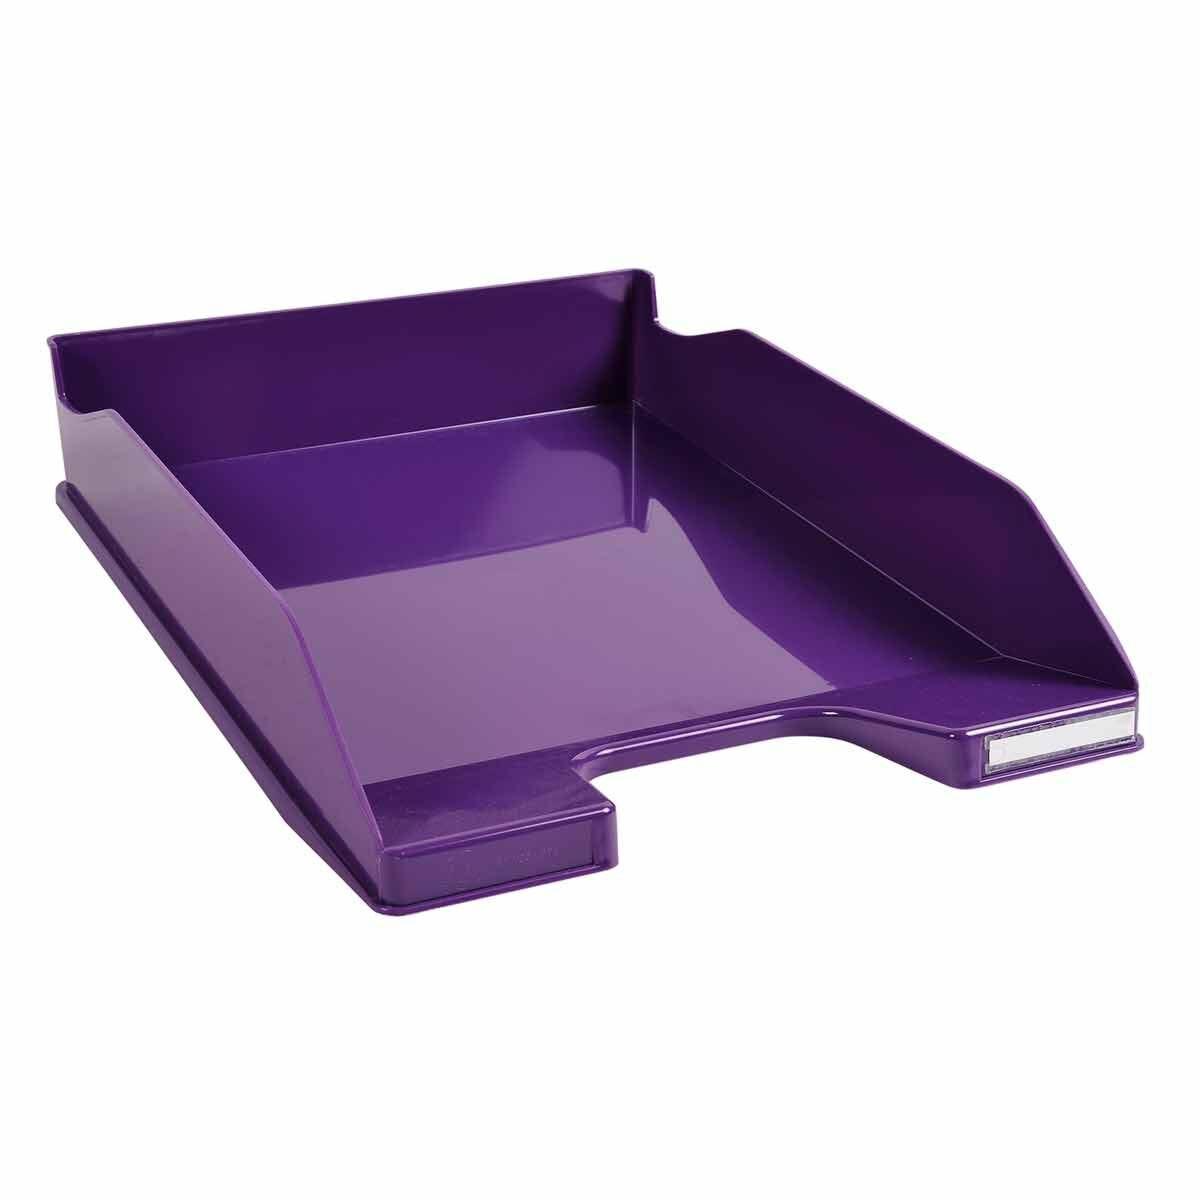 Exacompta Office Letter Tray Midi Combo Pack of 6 Gloss Purple